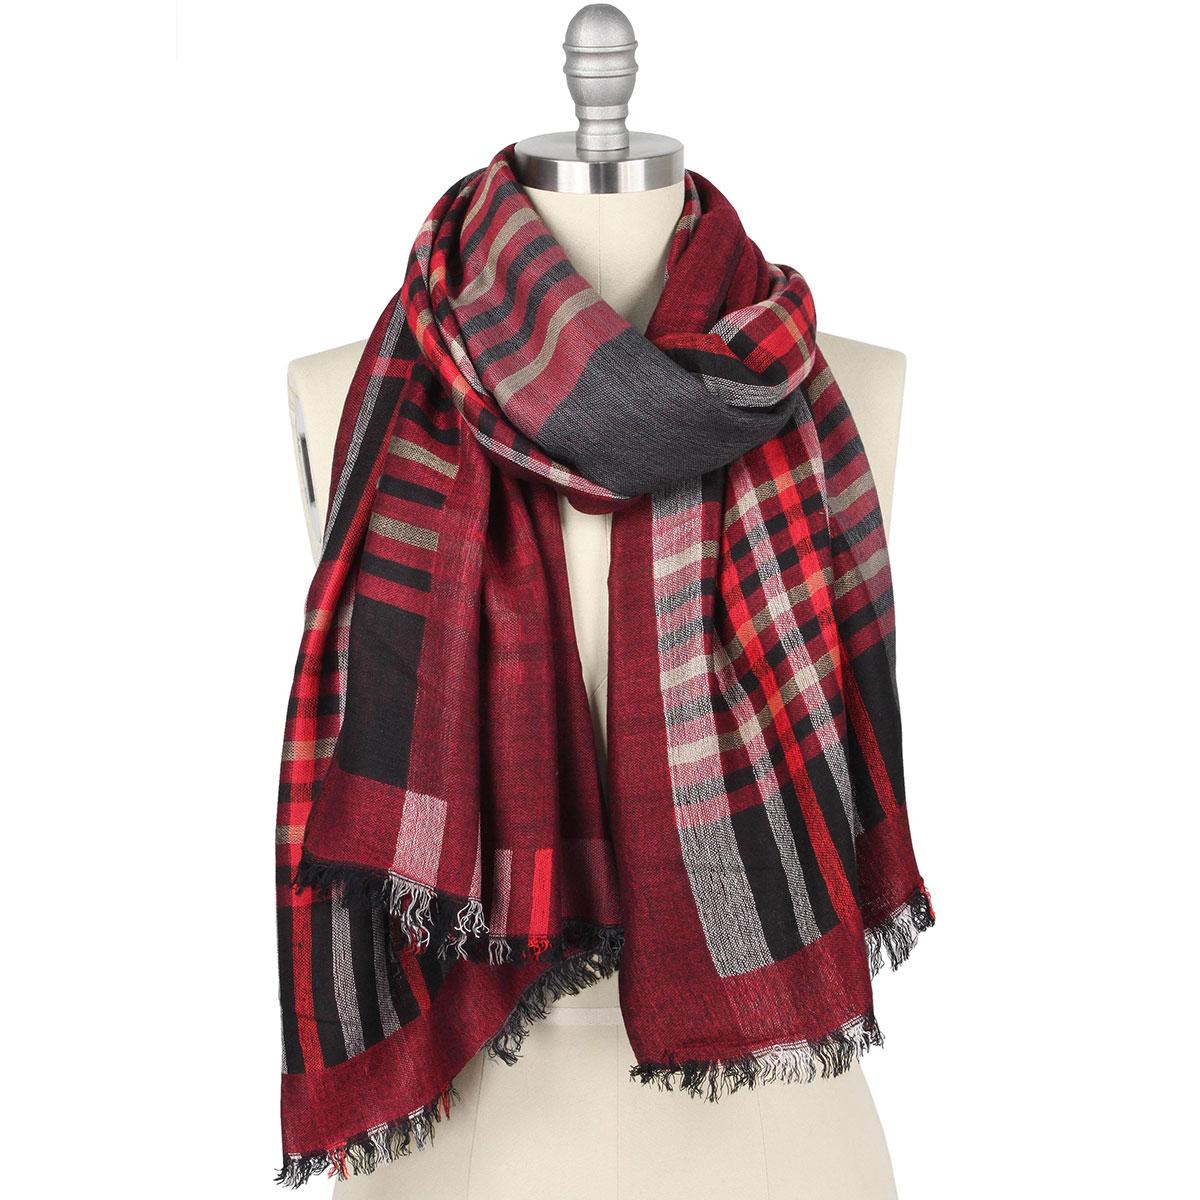 Oblong Scarves/Shawls - Plaid 9525 - Burgundy